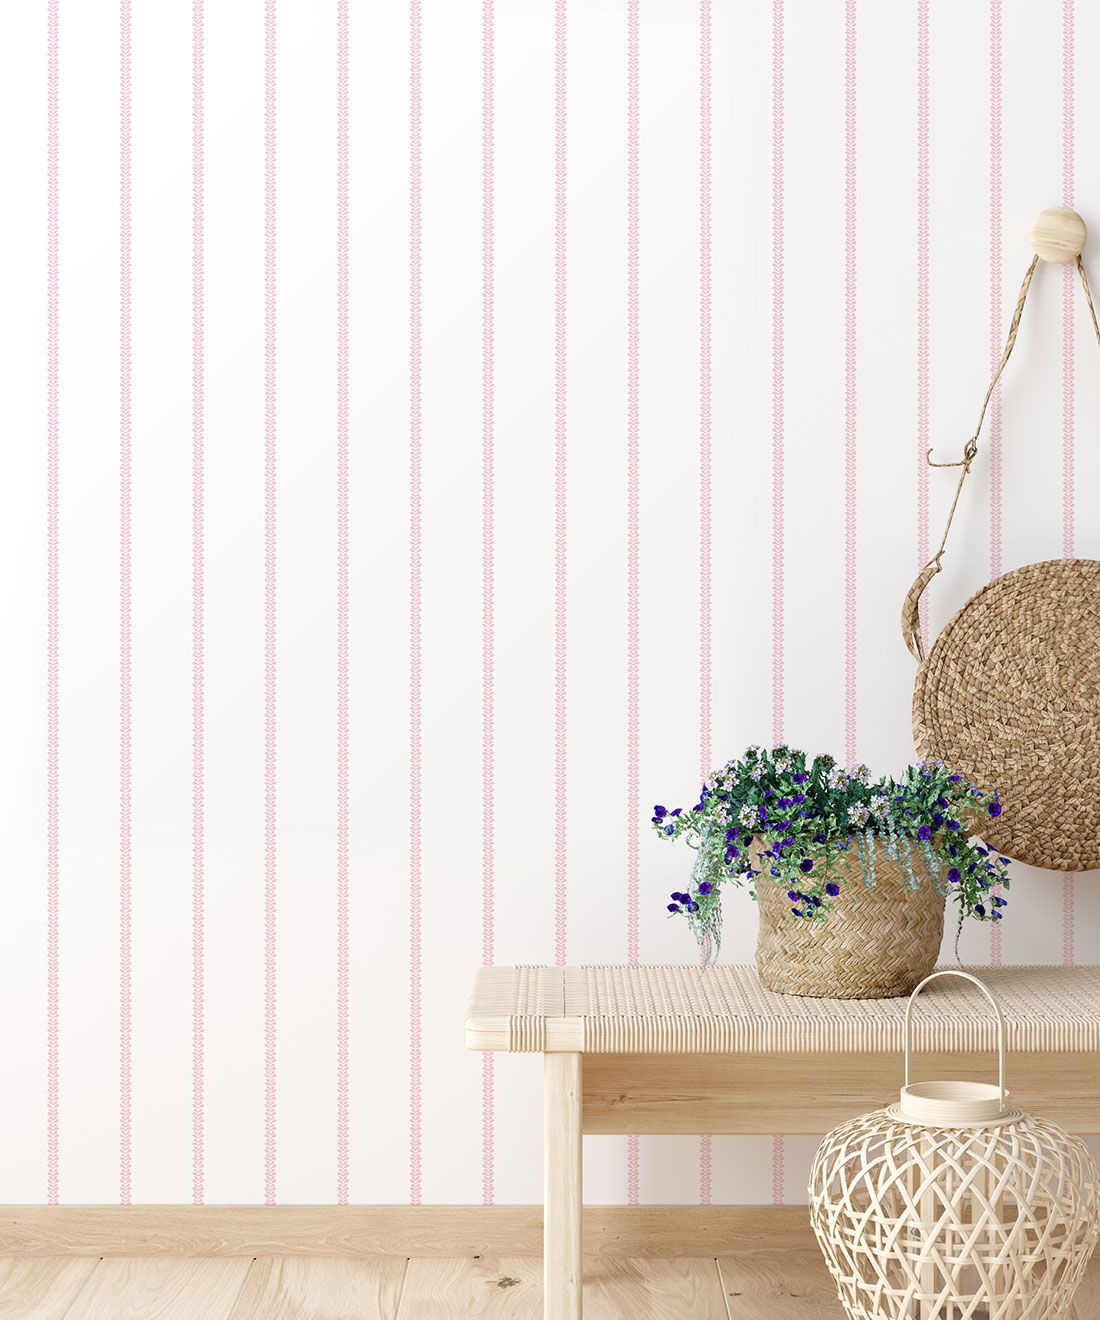 Chemin Wallpaper • Striped Wallpaper • Blush • Insitu